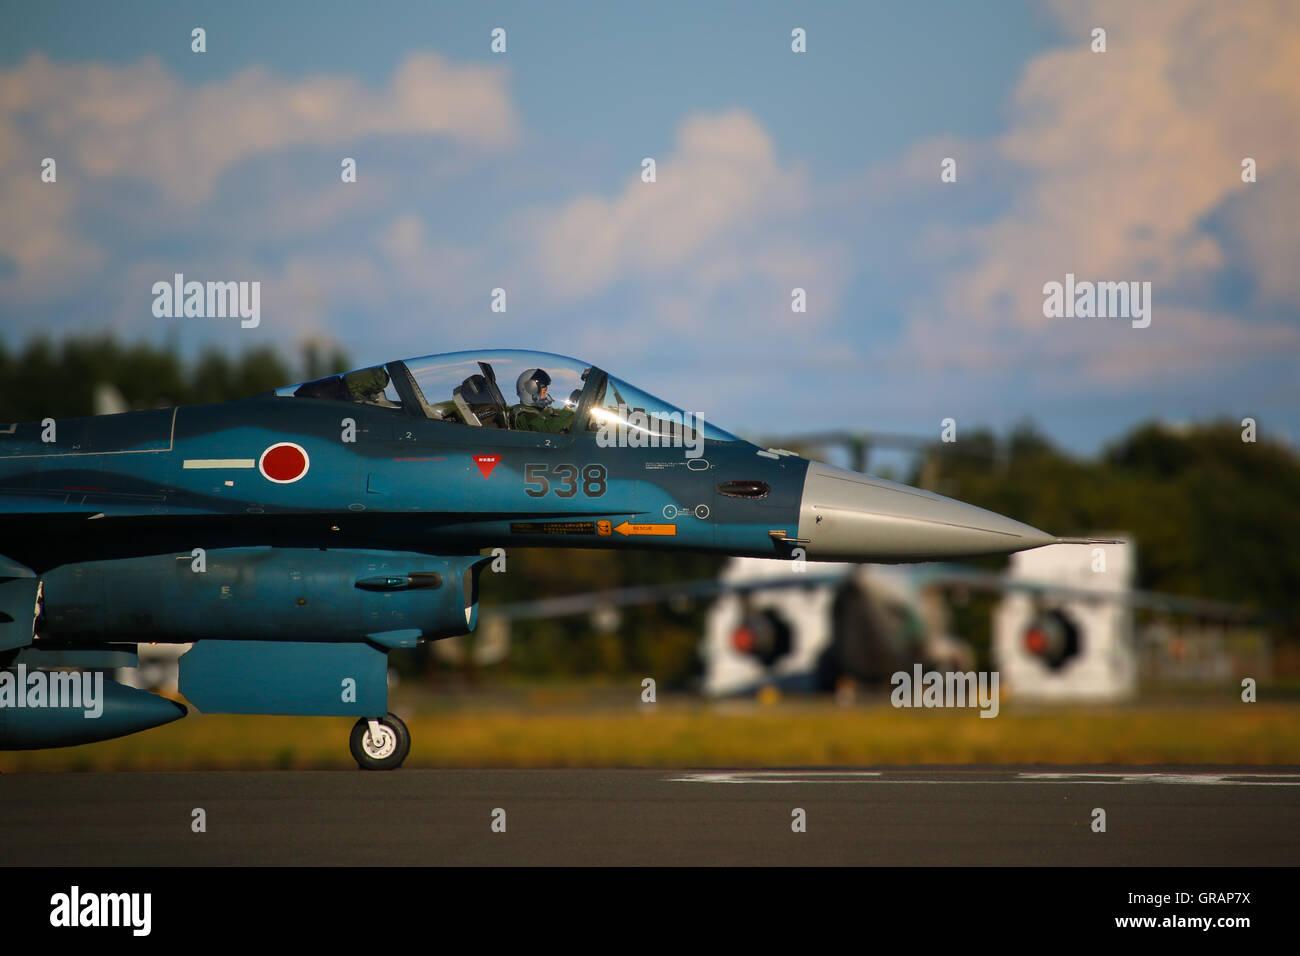 Military Airplane On Runway - Stock Image